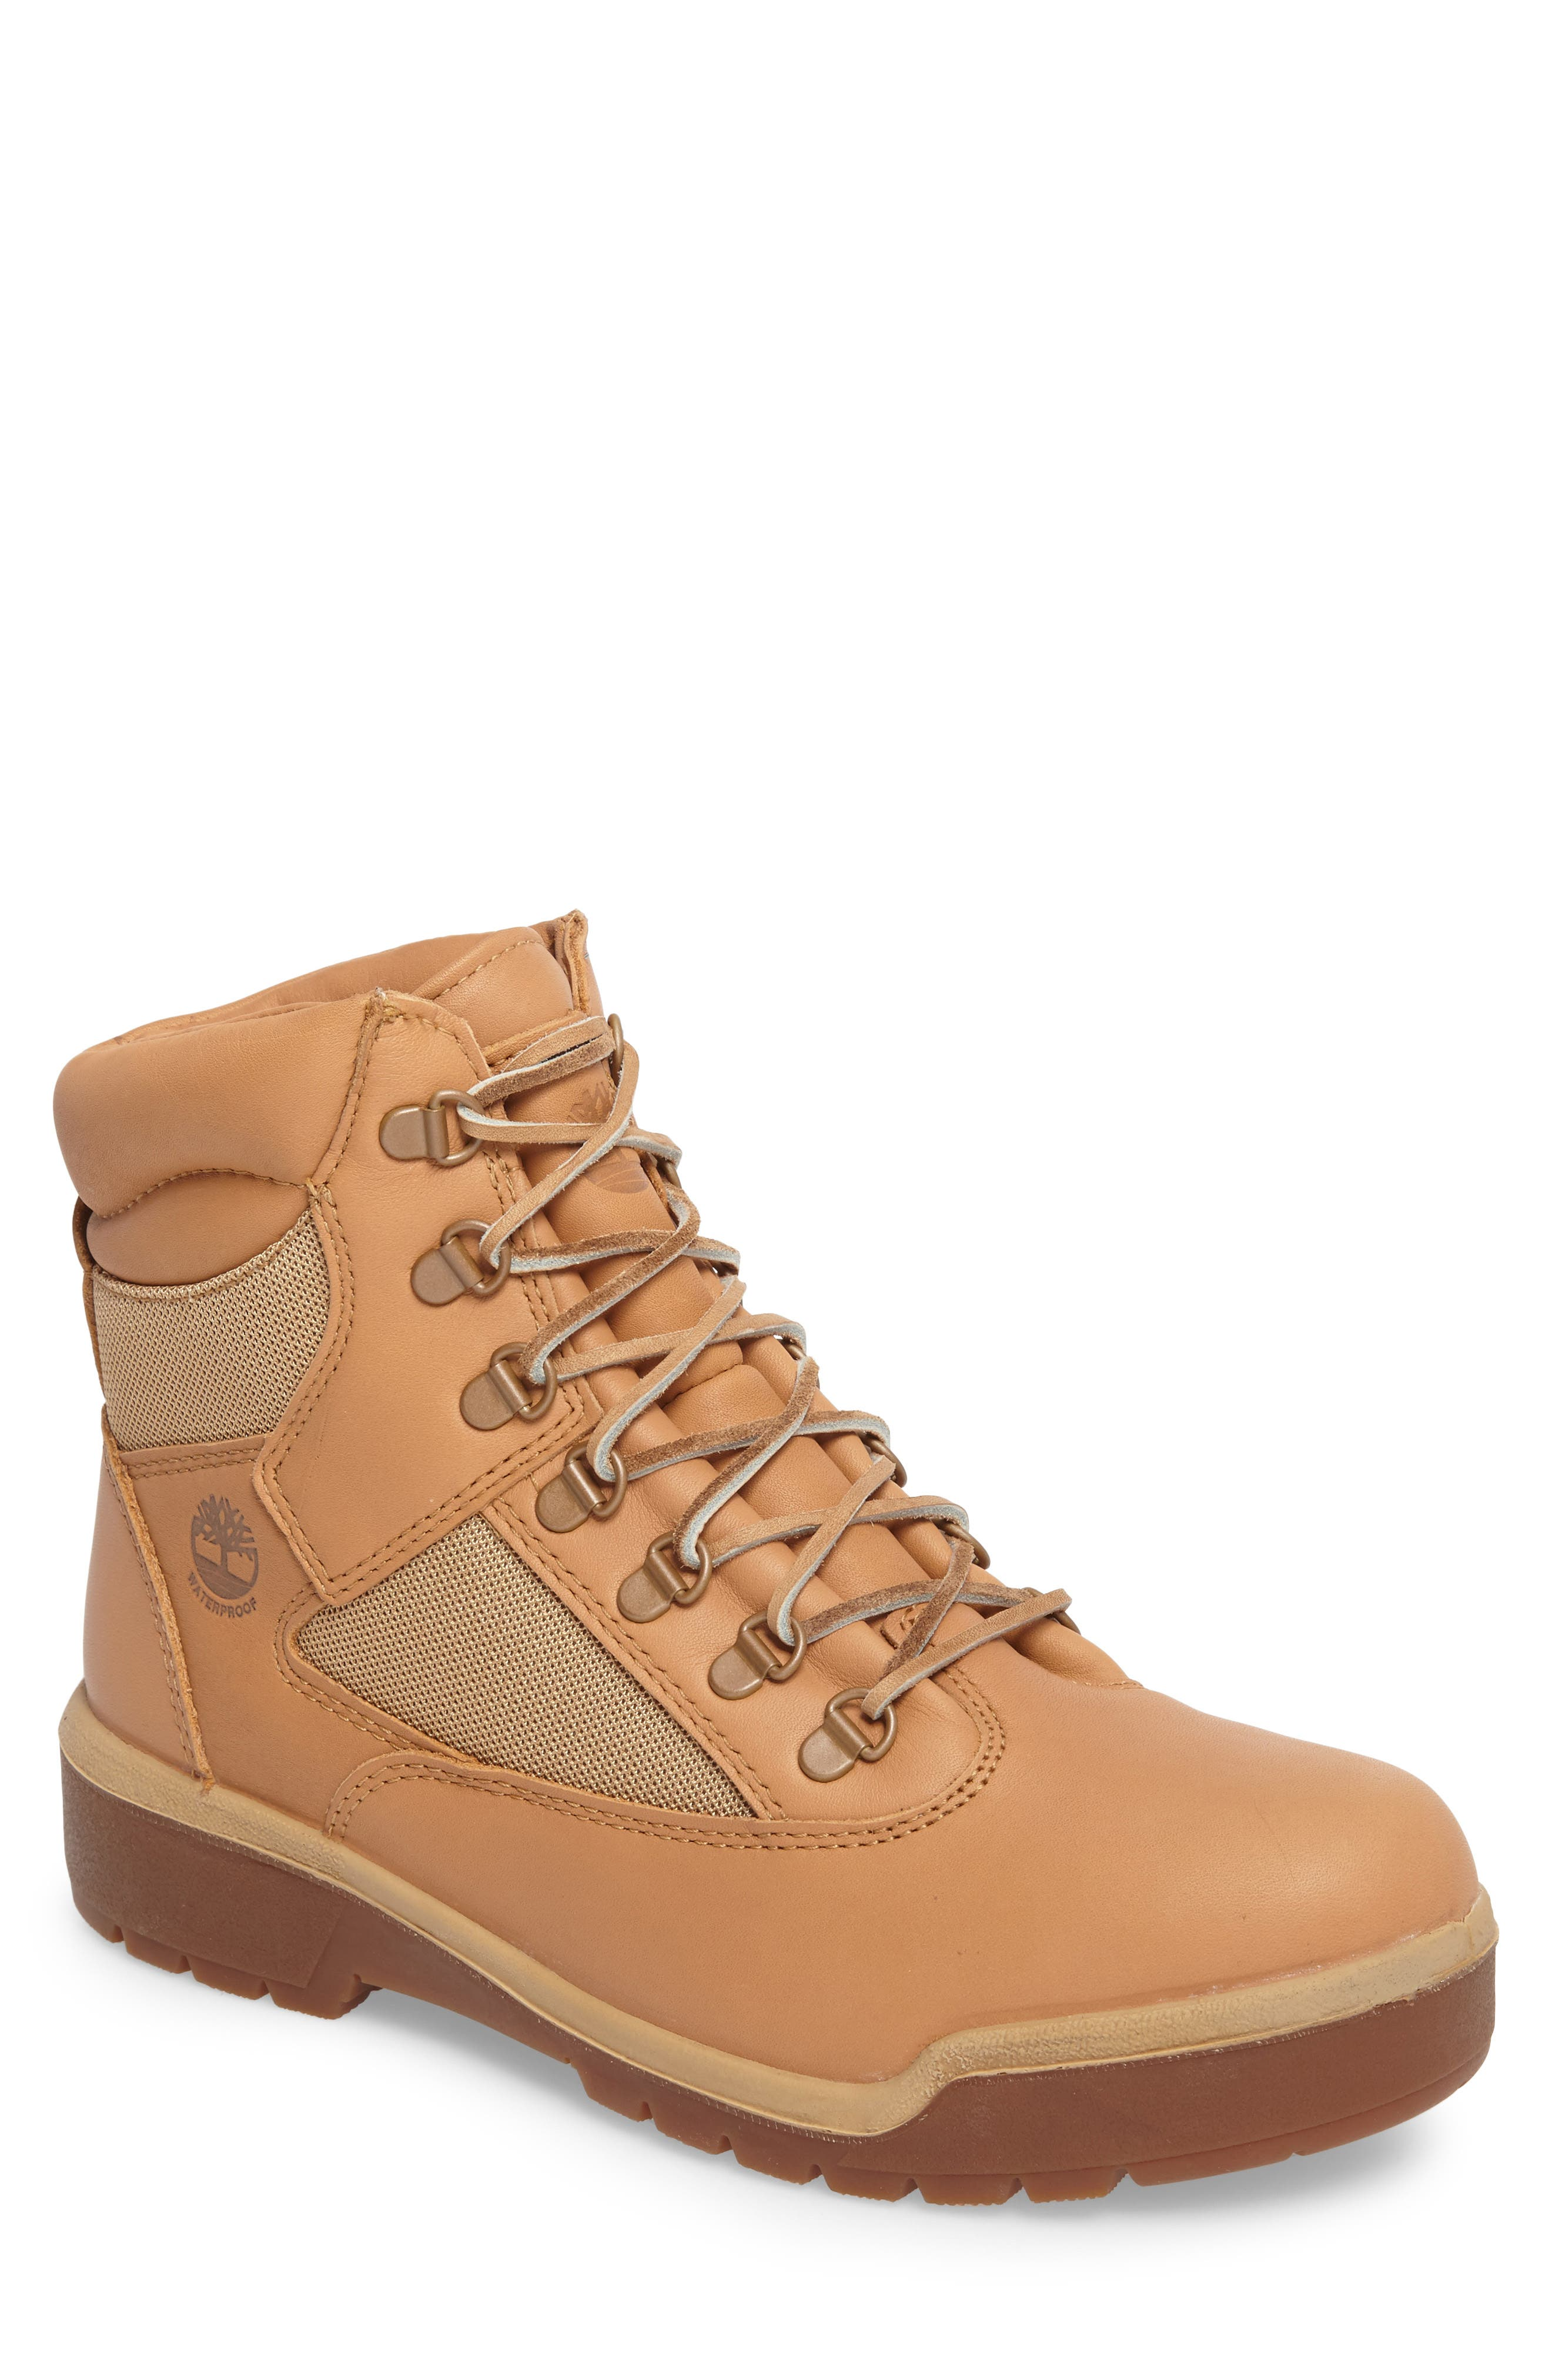 Waterproof Boot,                             Main thumbnail 1, color,                             Natural Hoween/ Latigo Leather